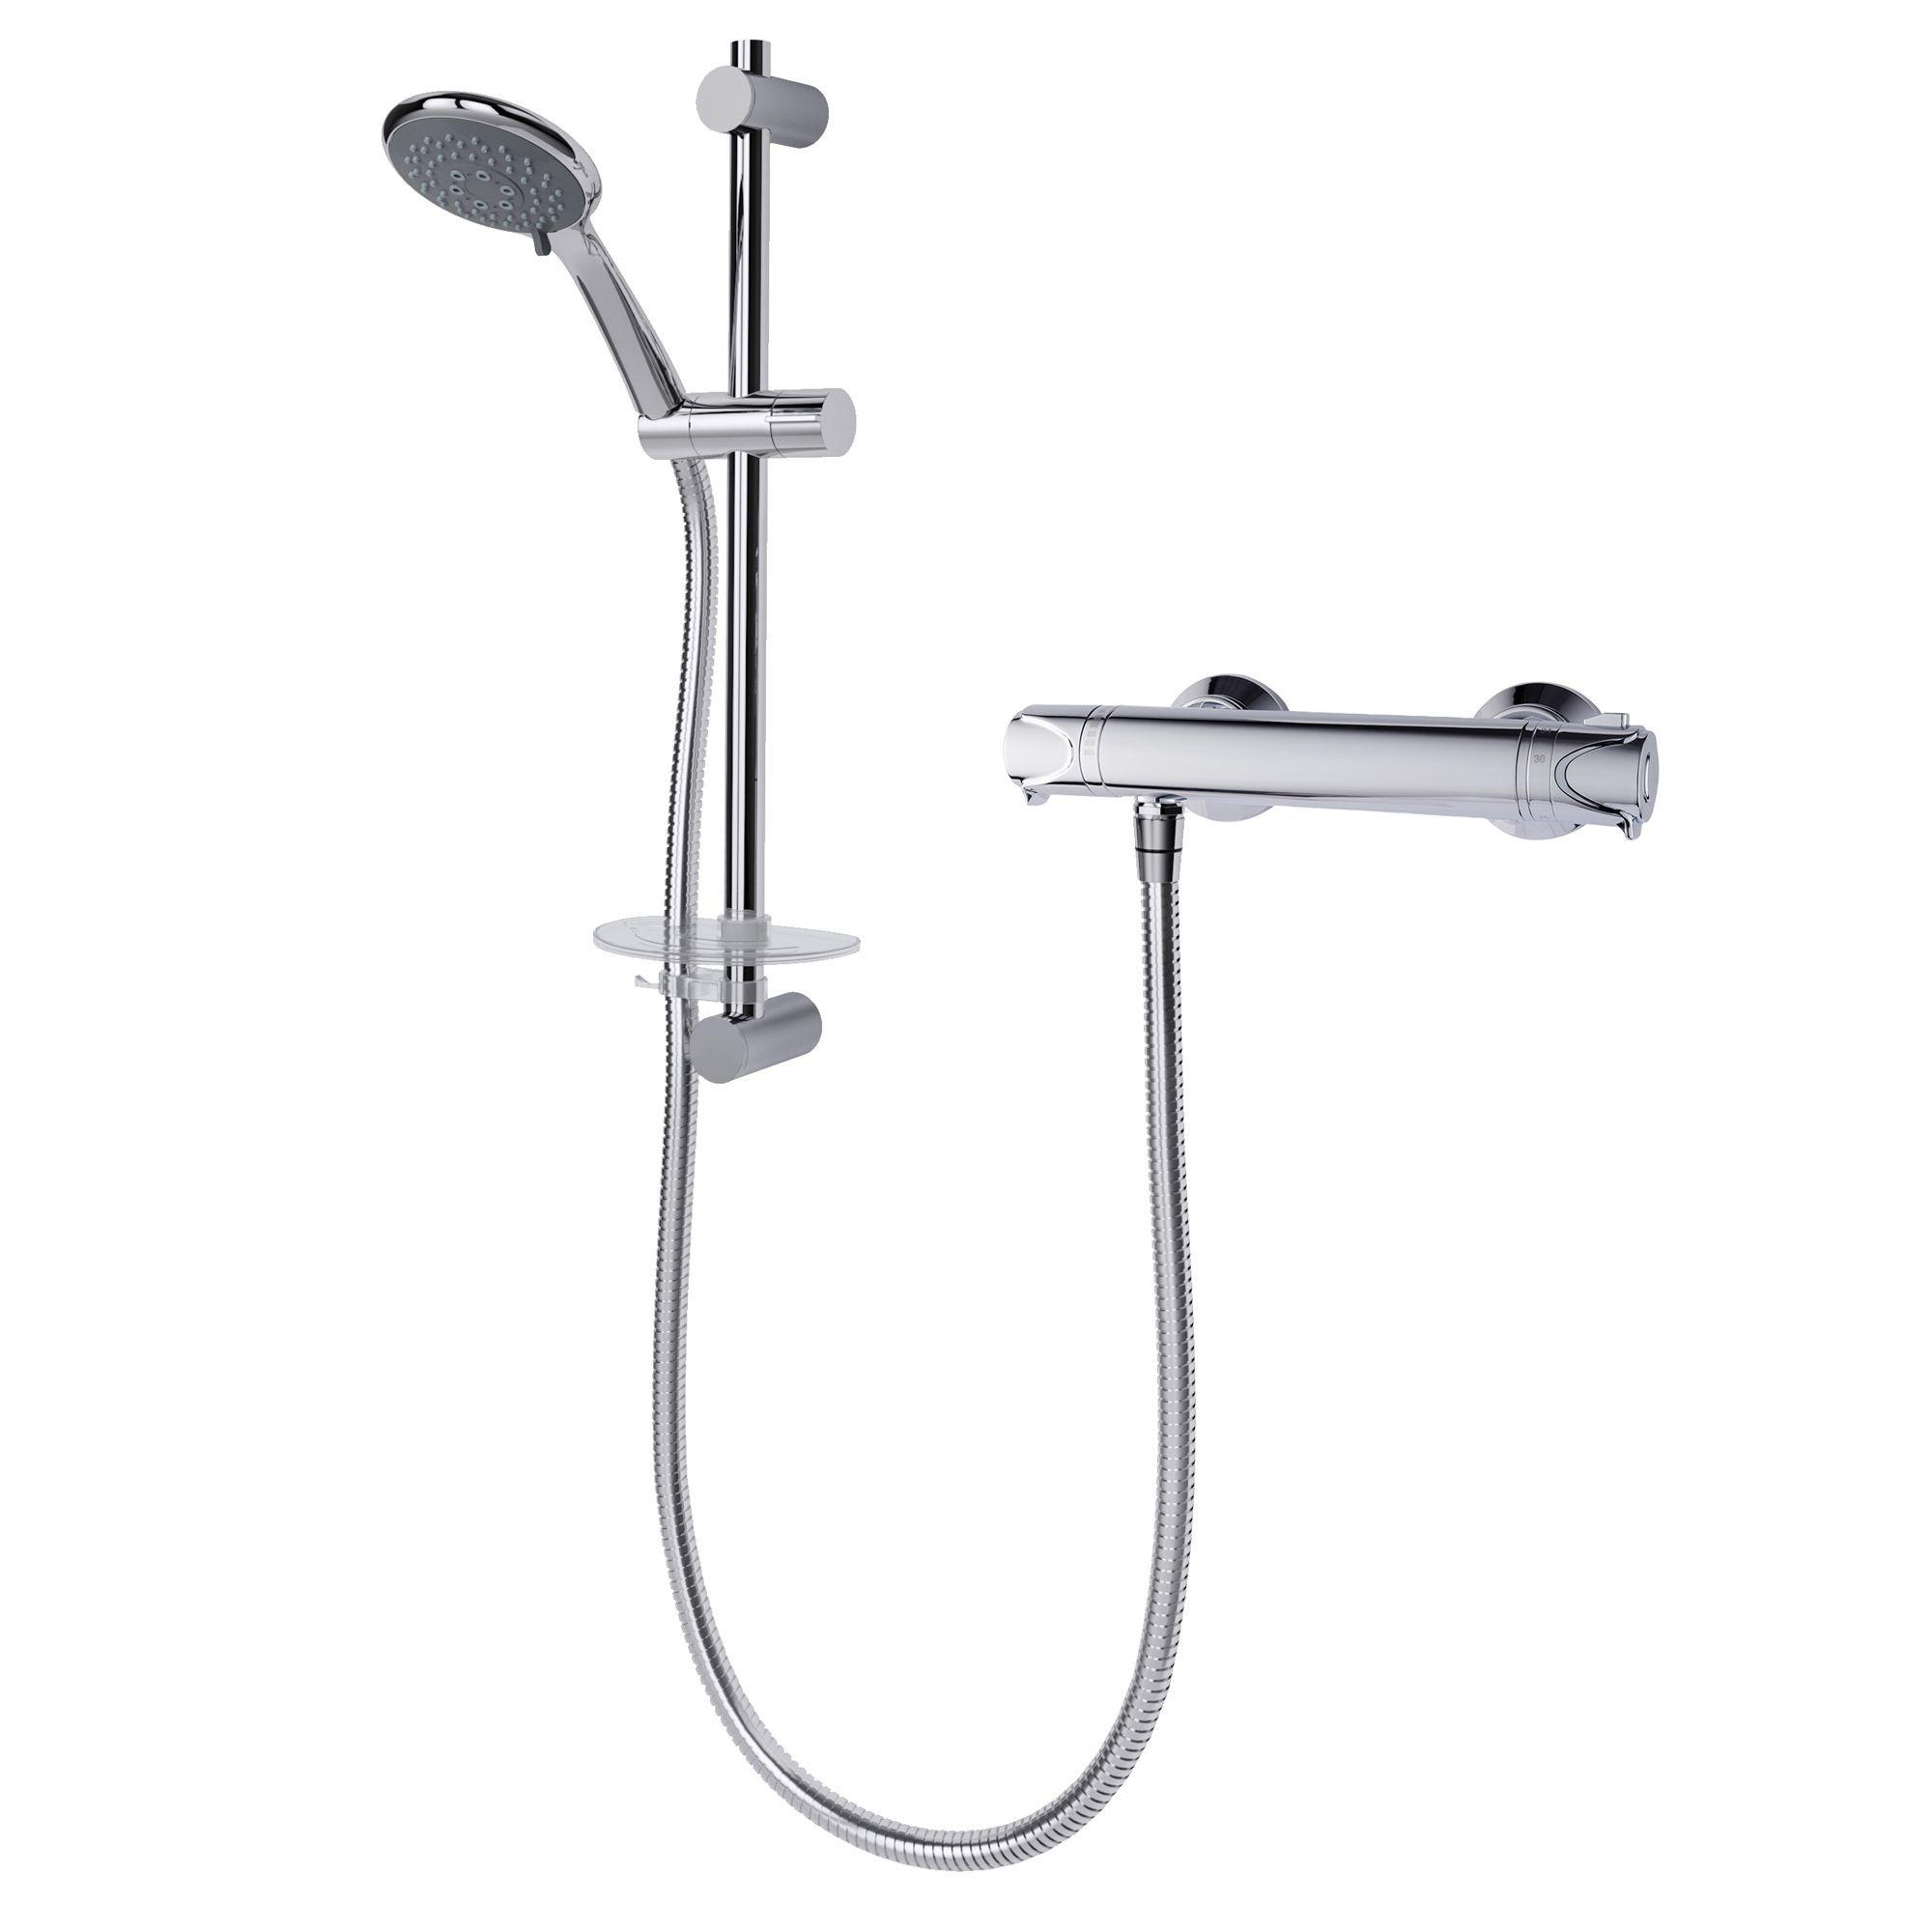 Triton Benito Rear Fed Chrome Effect Thermostatic Bar Mixer Shower